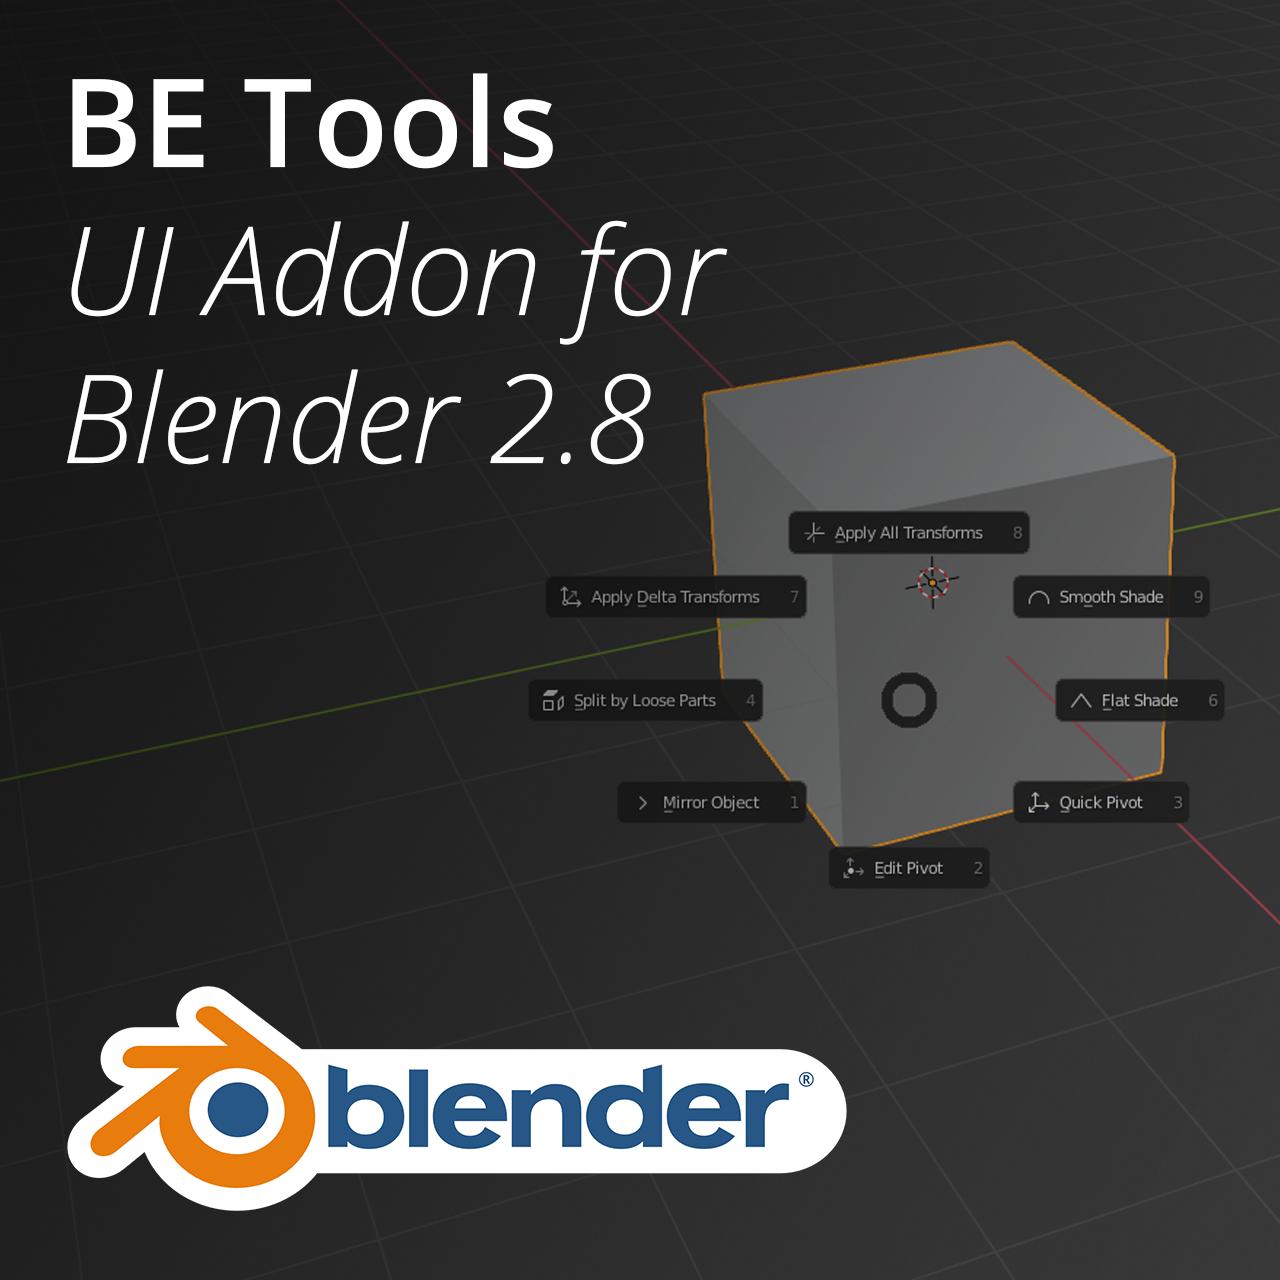 BE Tools for Blender